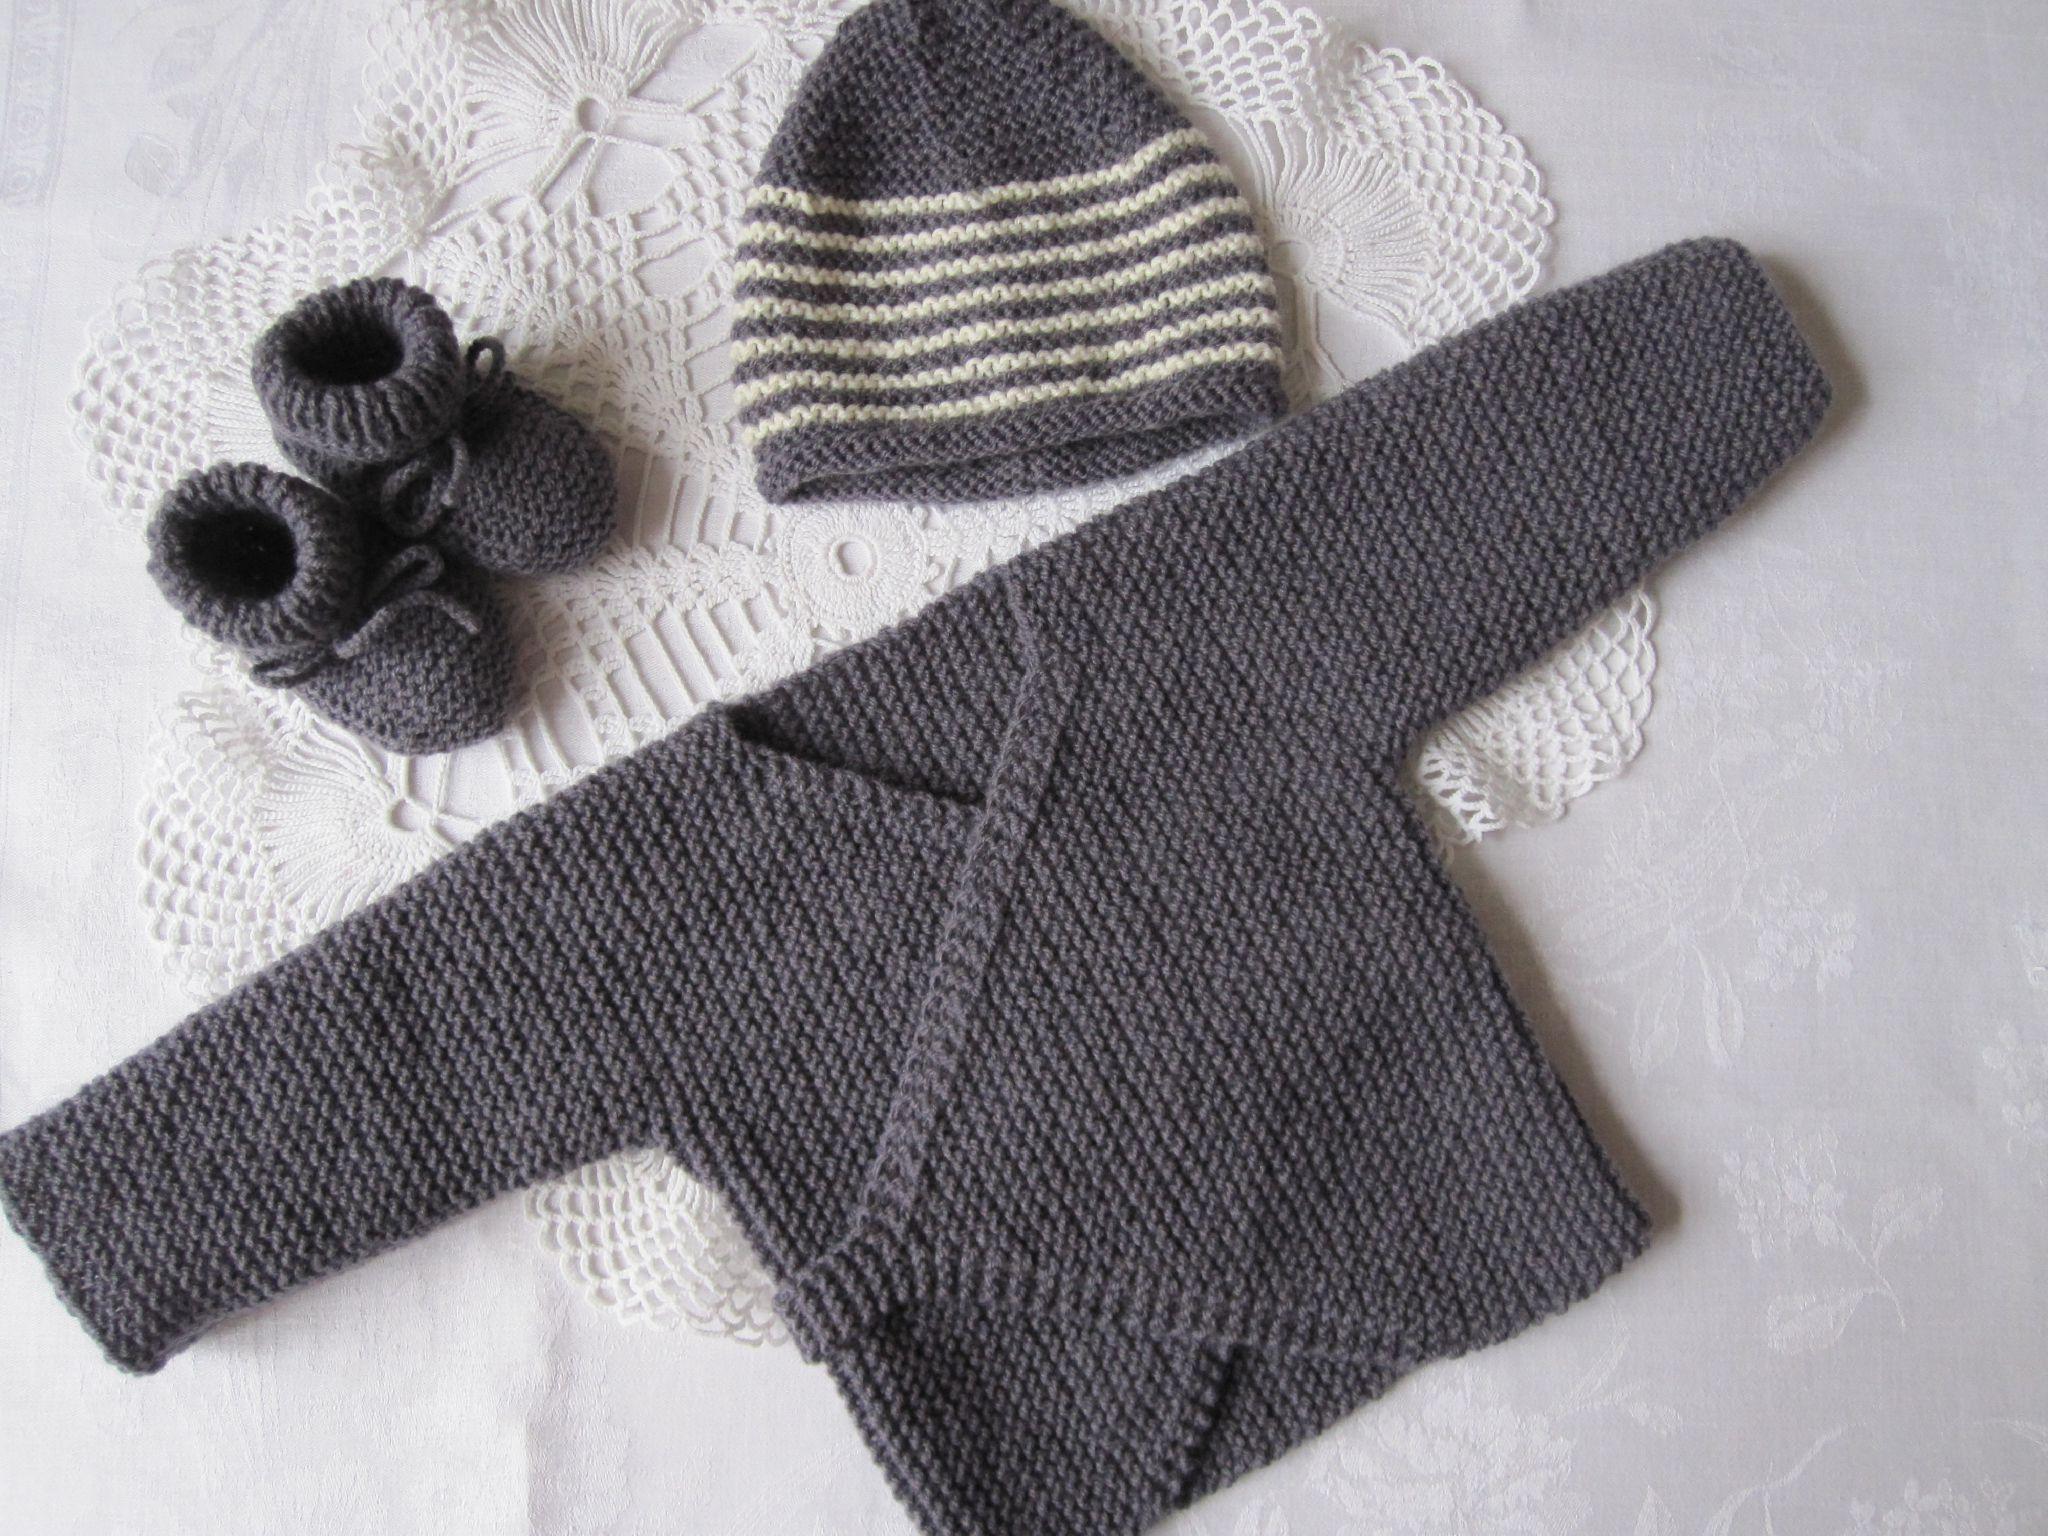 tuto tricot layette naissance